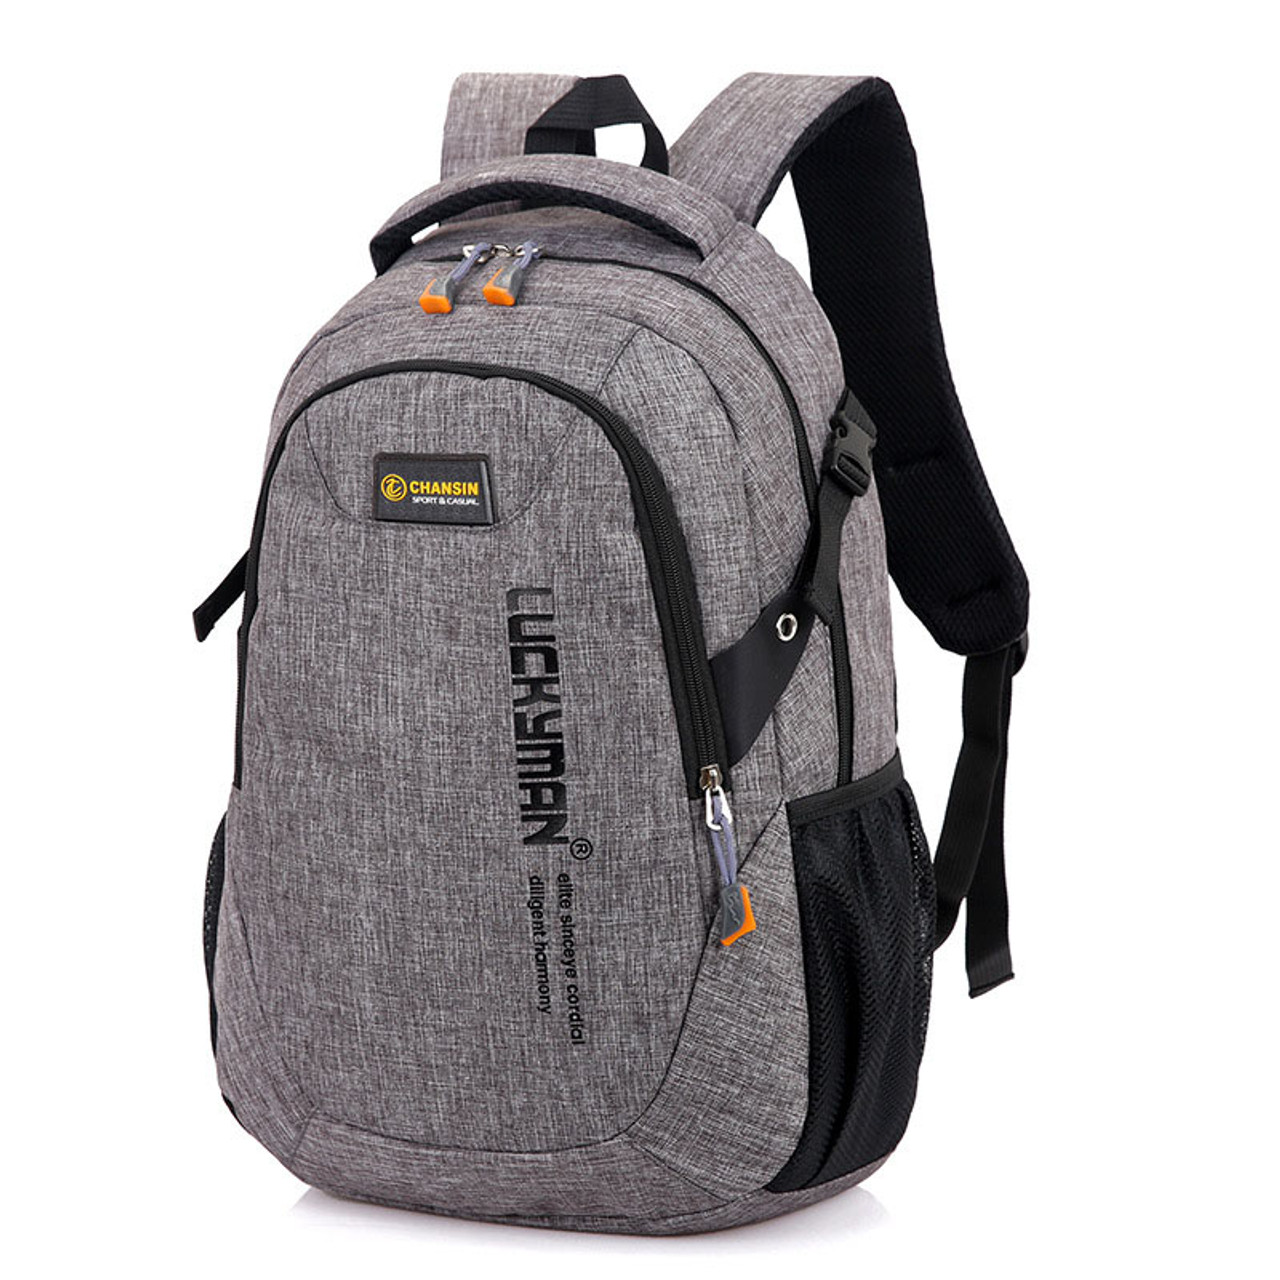 2137de48def9 Men s Backpack Women Backpack Female School Bag For Teenagers Men Laptop  Backpacks Men Travel Bags Large ...